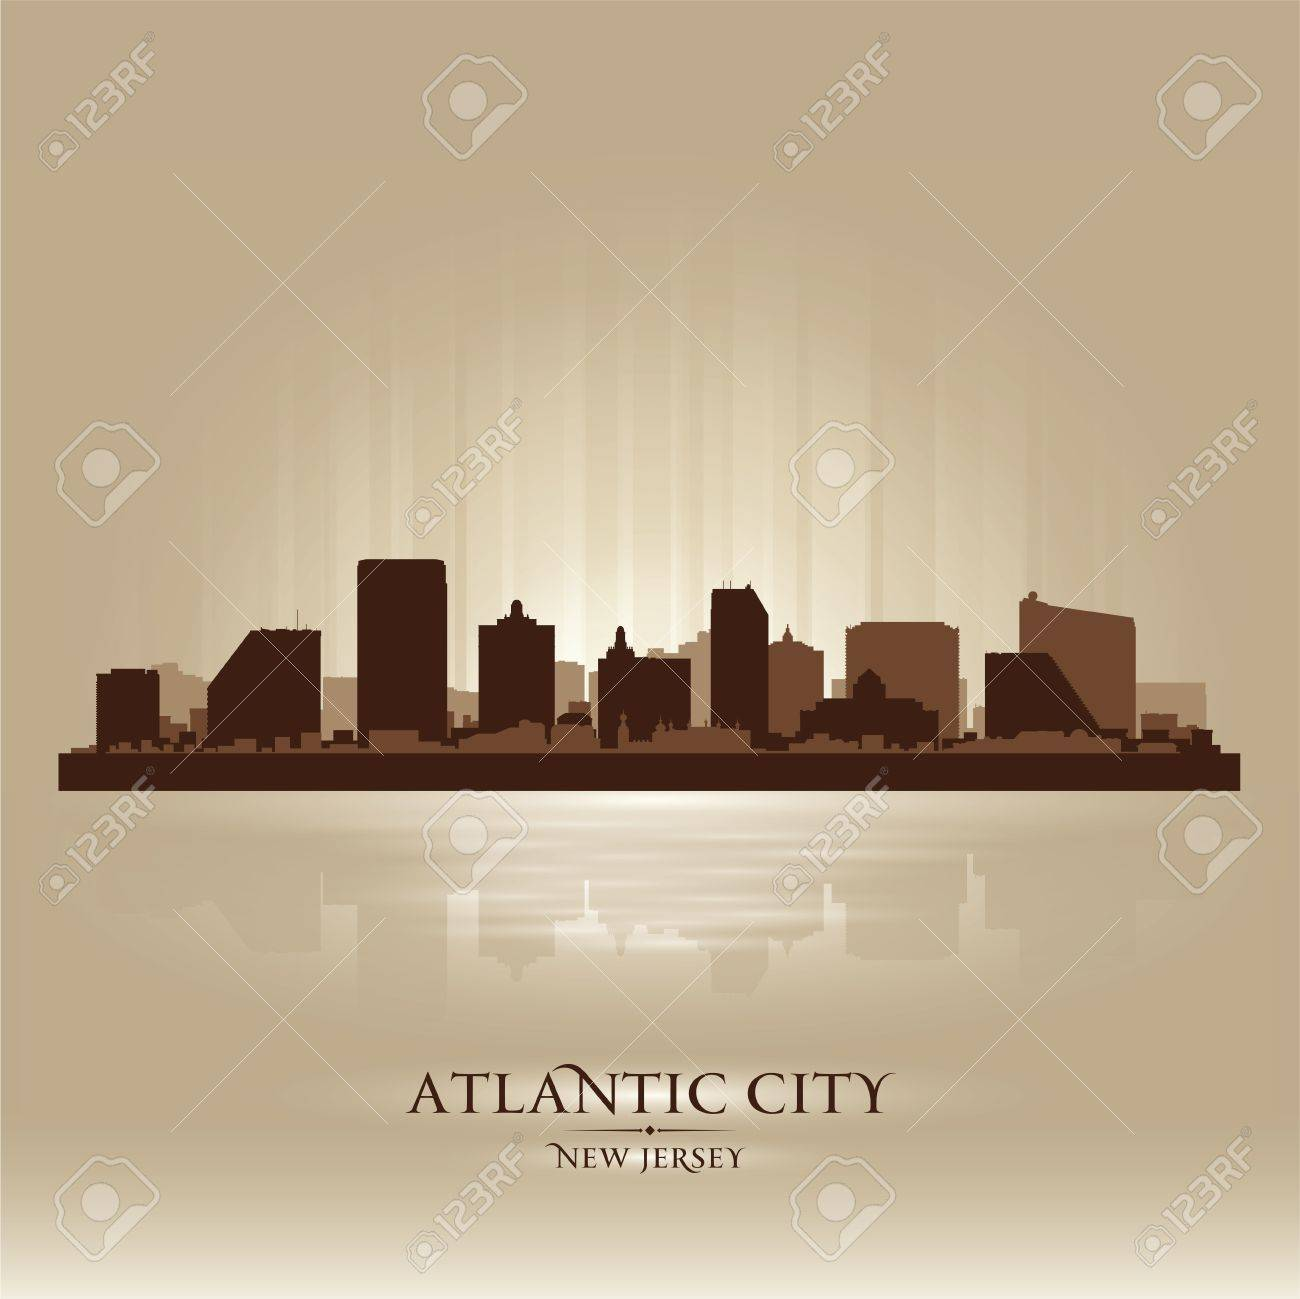 Atlantic City, New Jersey skyline city silhouette Stock Vector - 17598673